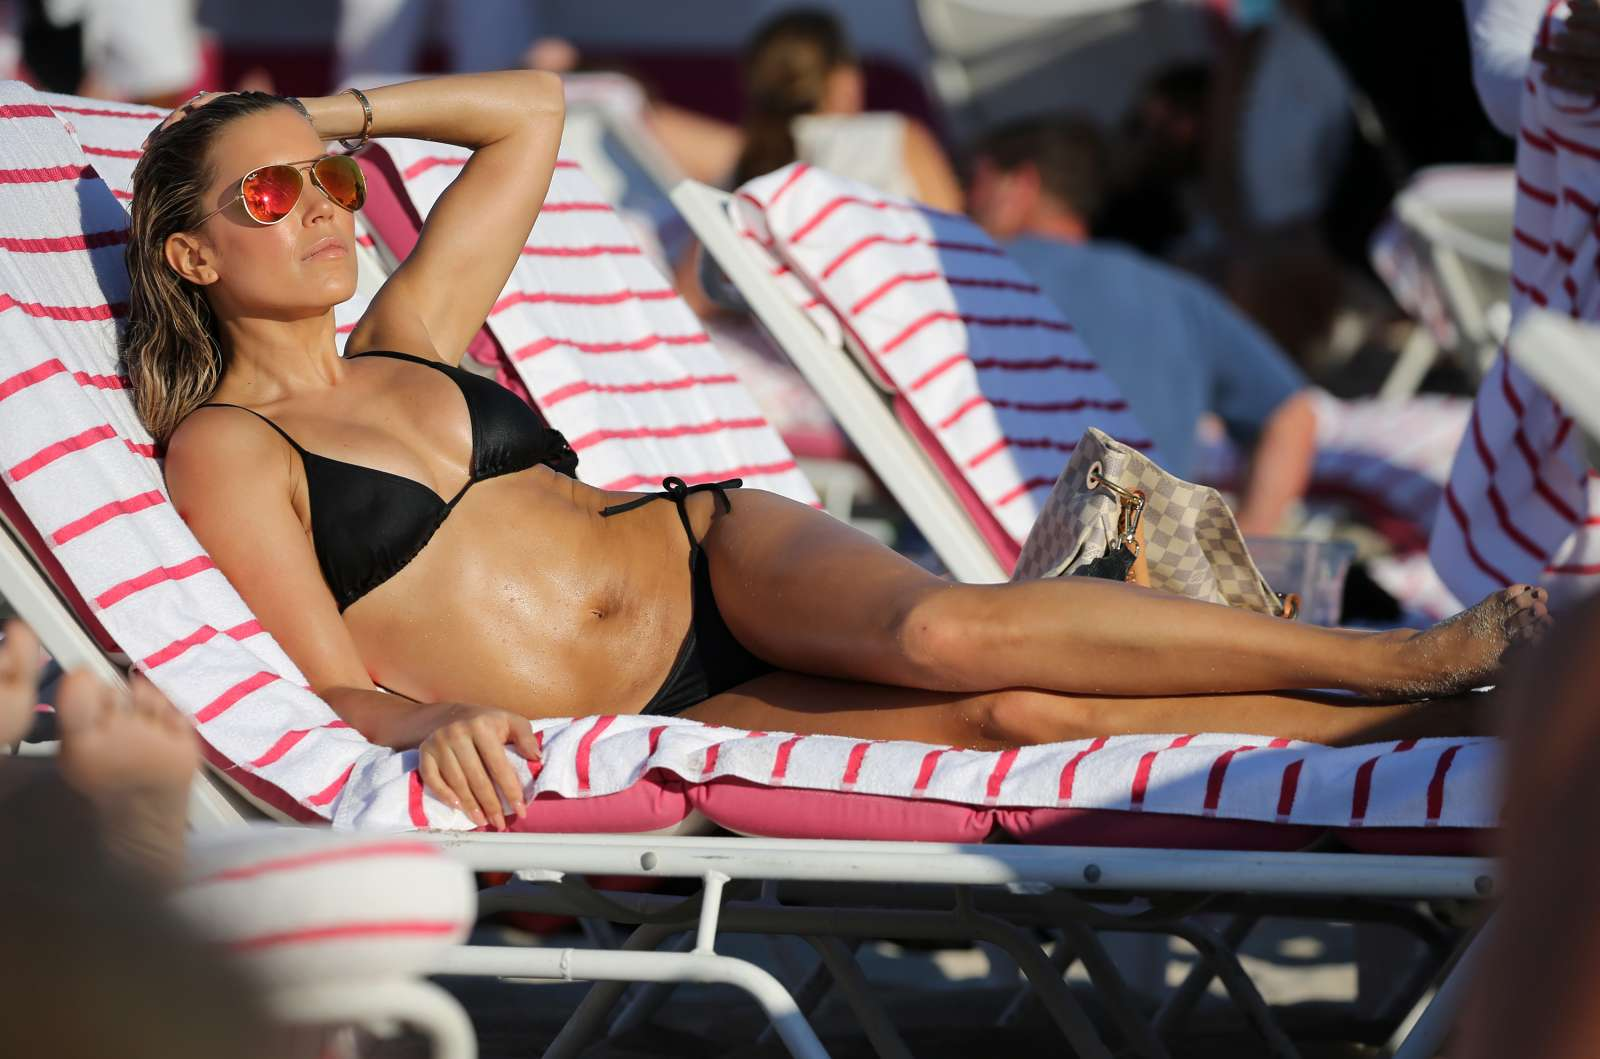 Sylvie Meis 2017 : Sylvie Meis in Black Bikini 2017 -19